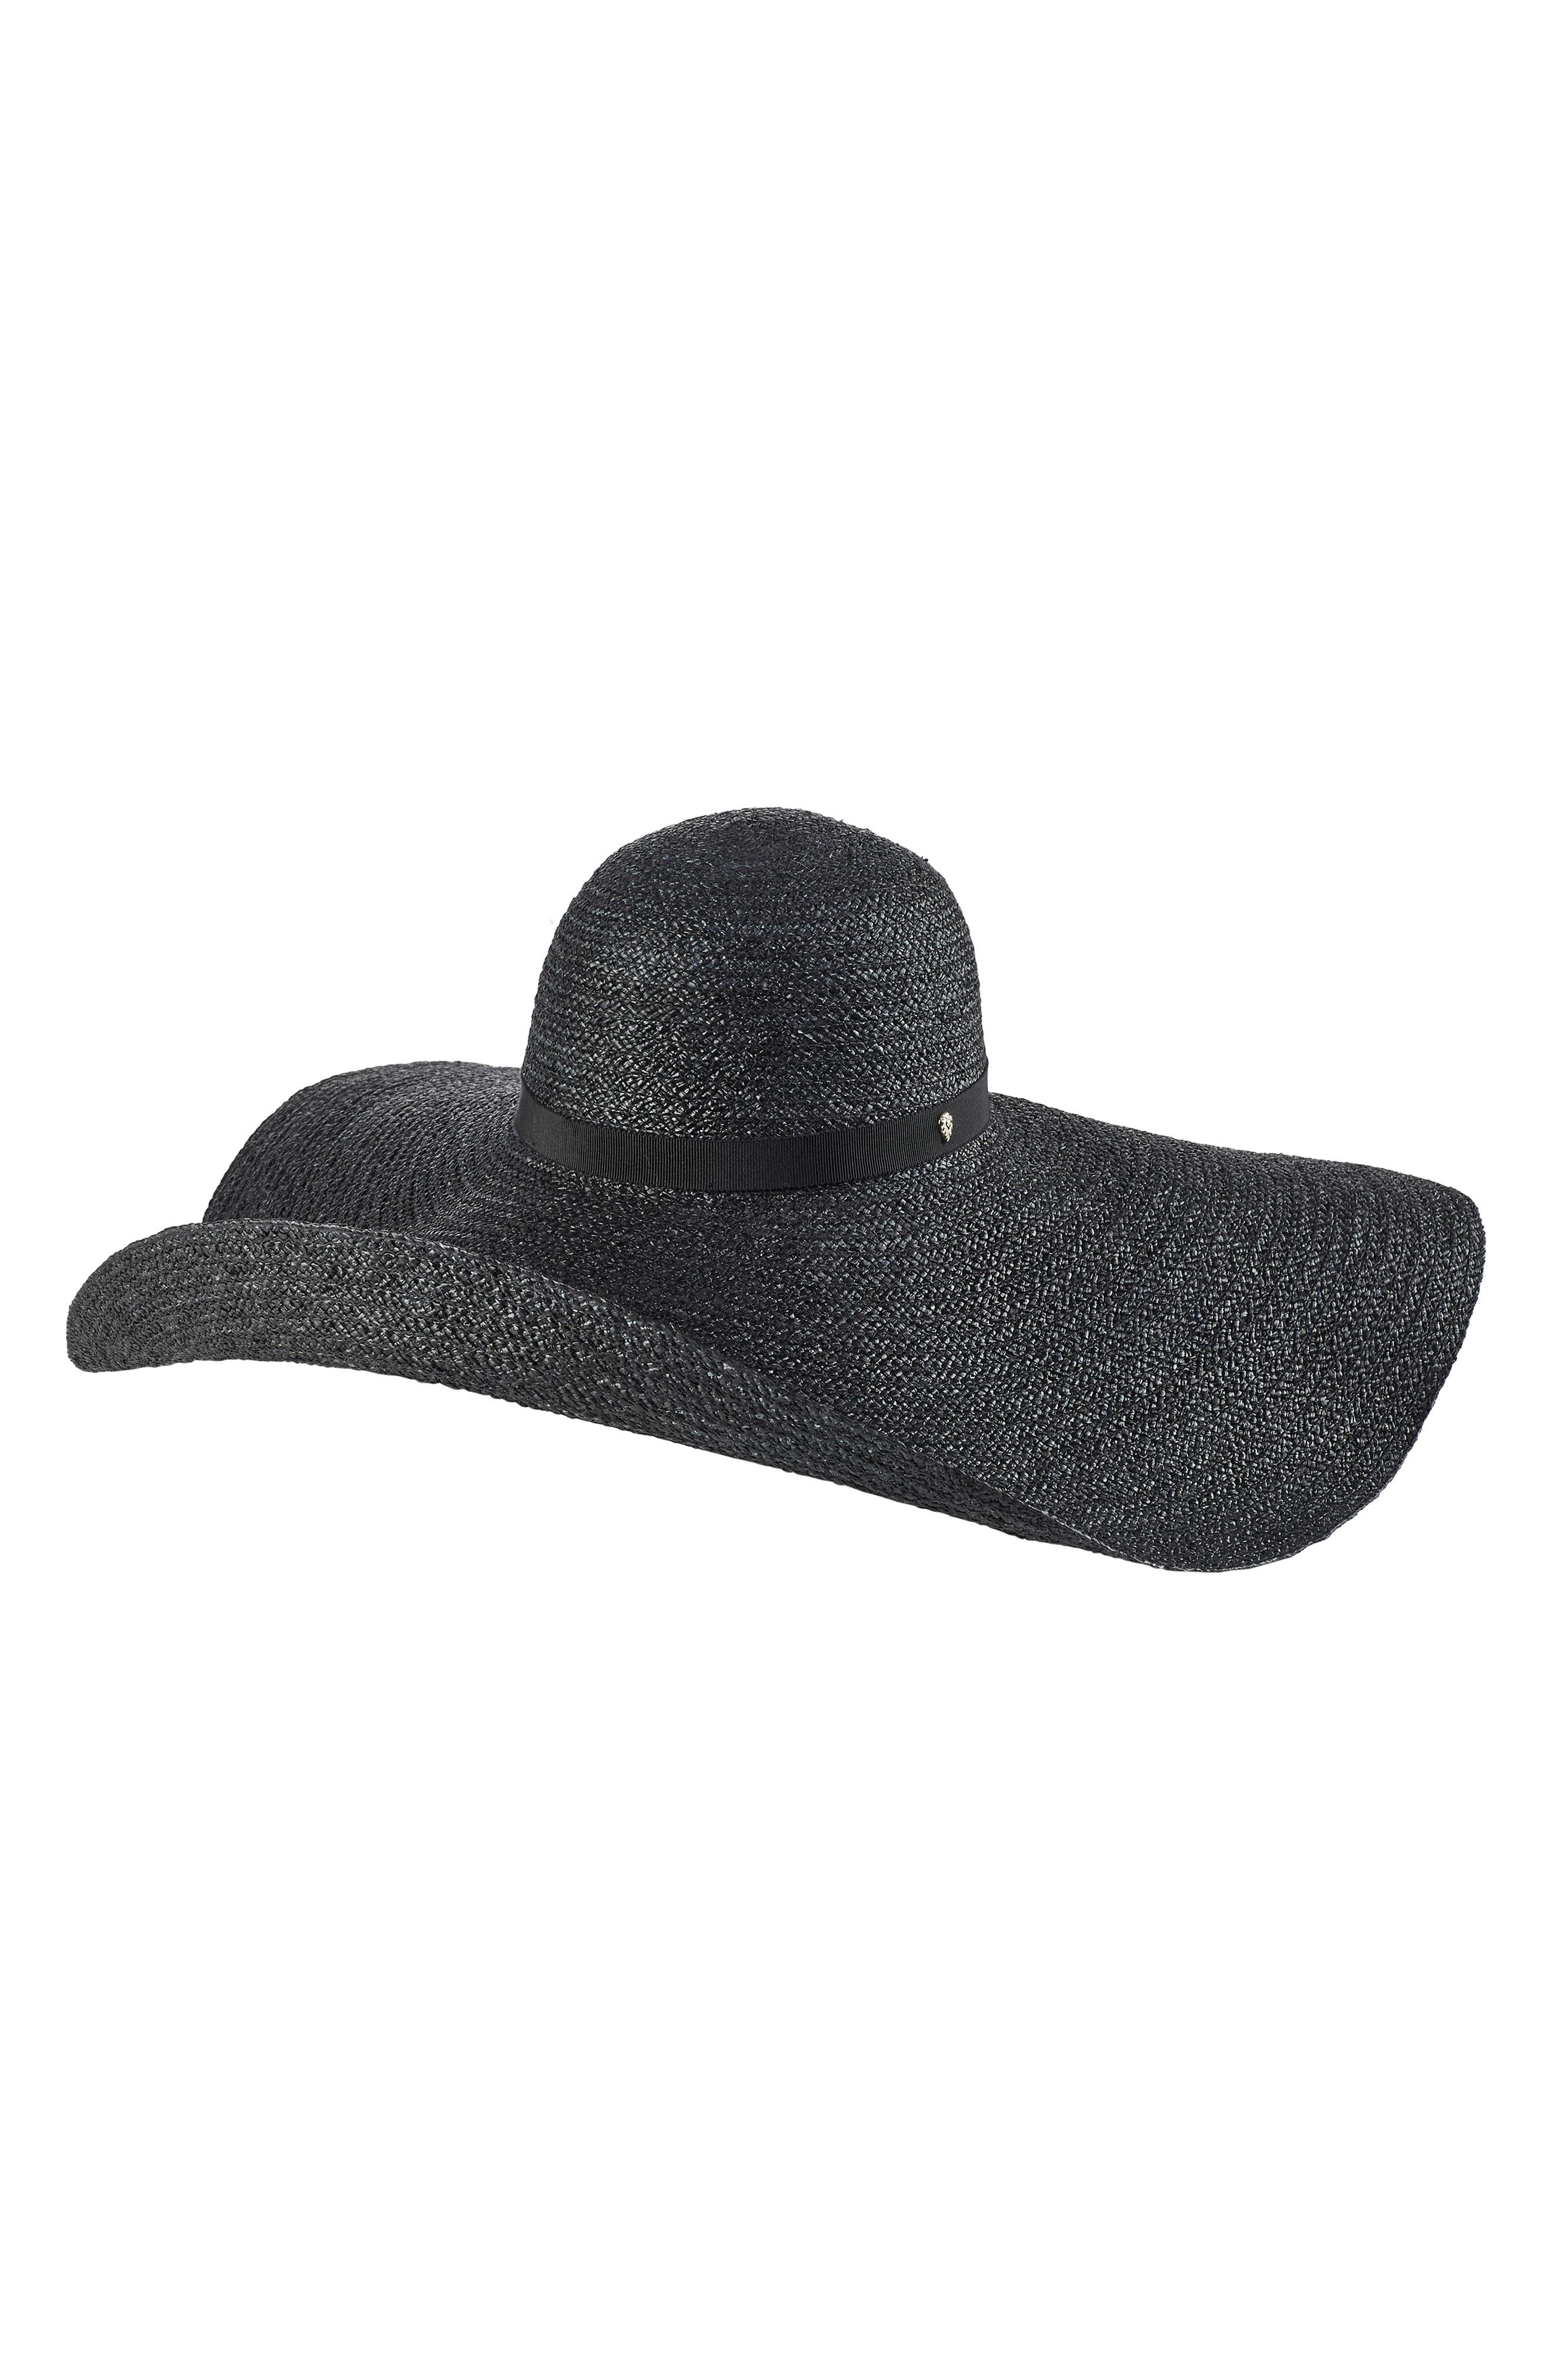 943a3fbd3e0b3d Helen Kaminski Wide Brim Raffia Hat - Black In Charcoal/ Black ...